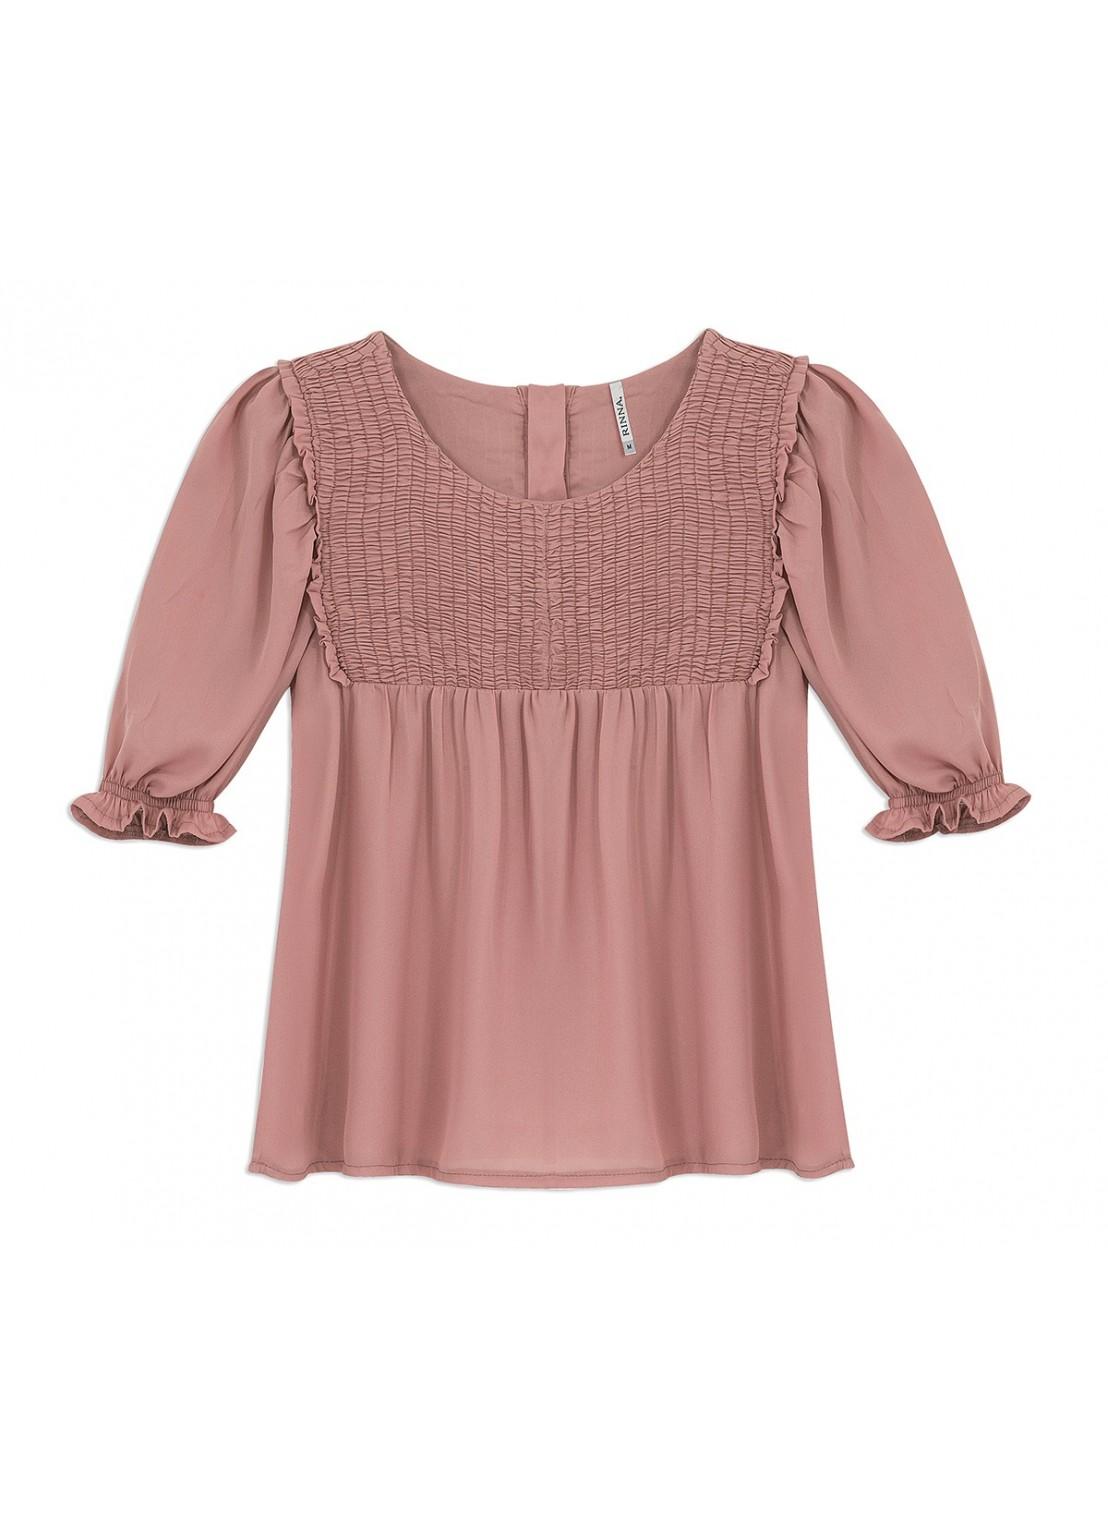 Blusa manga corta palo de rosa